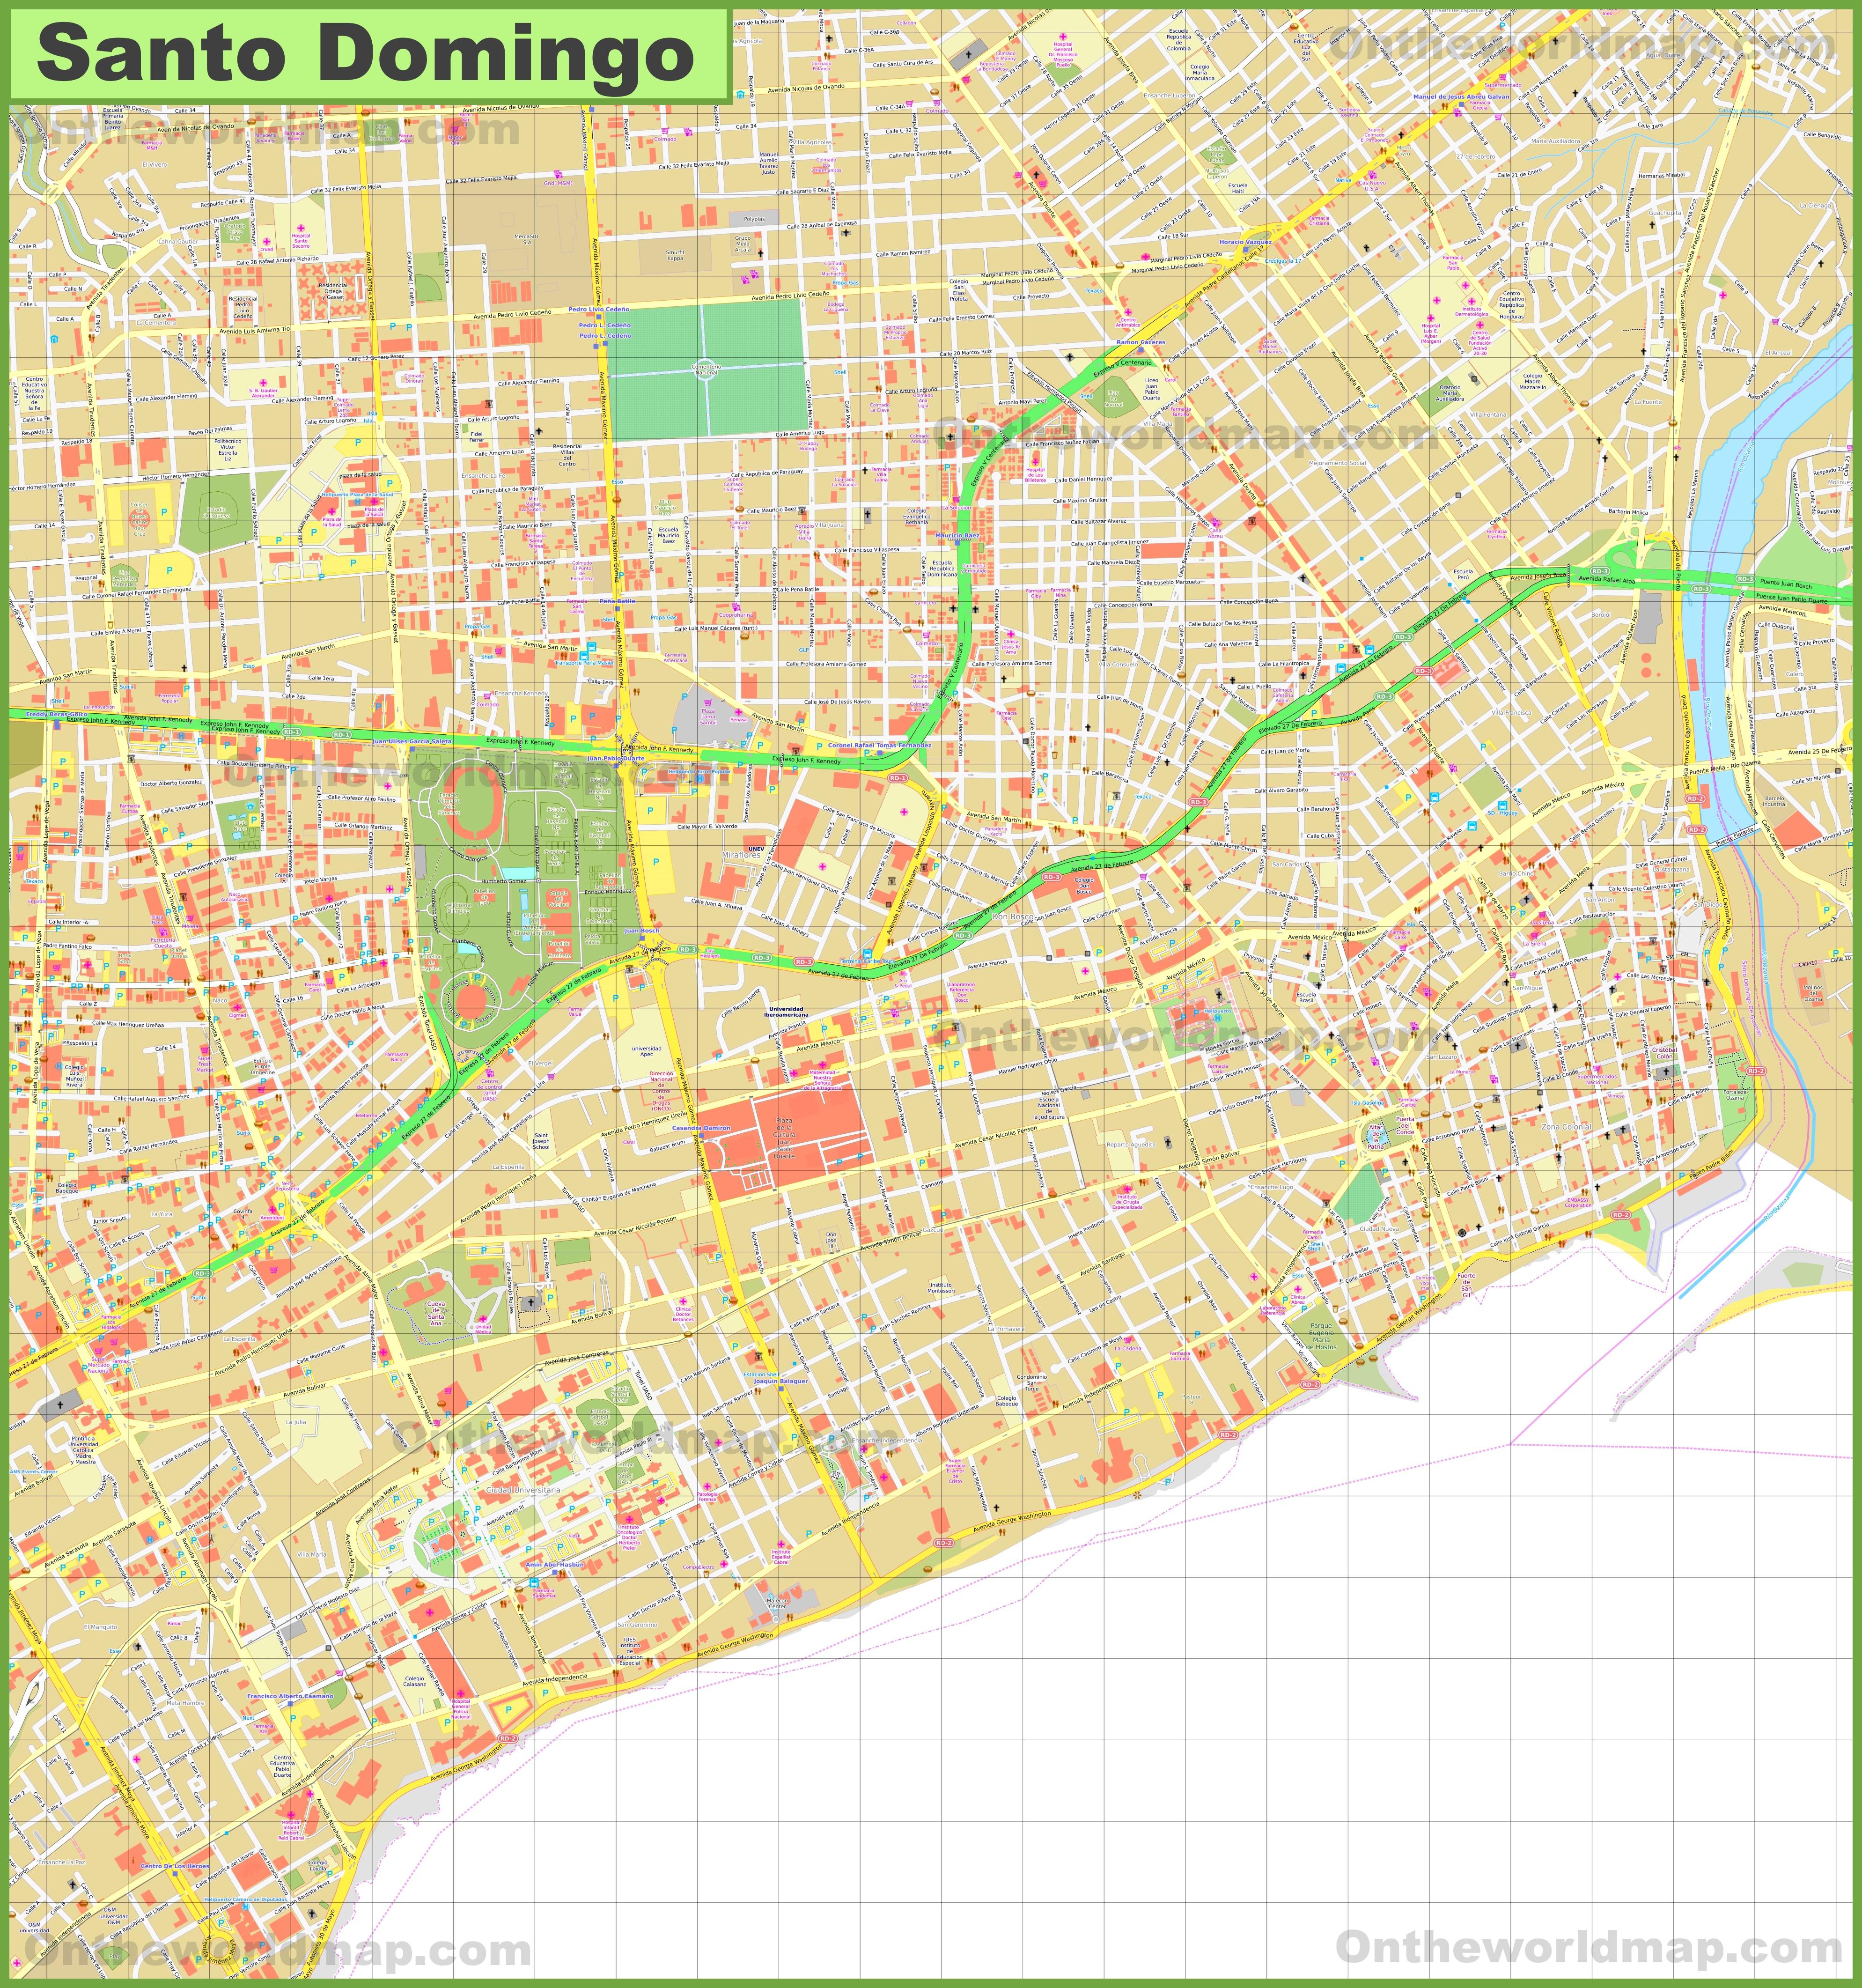 Santo Domingo City Center Map - Santo domingo map